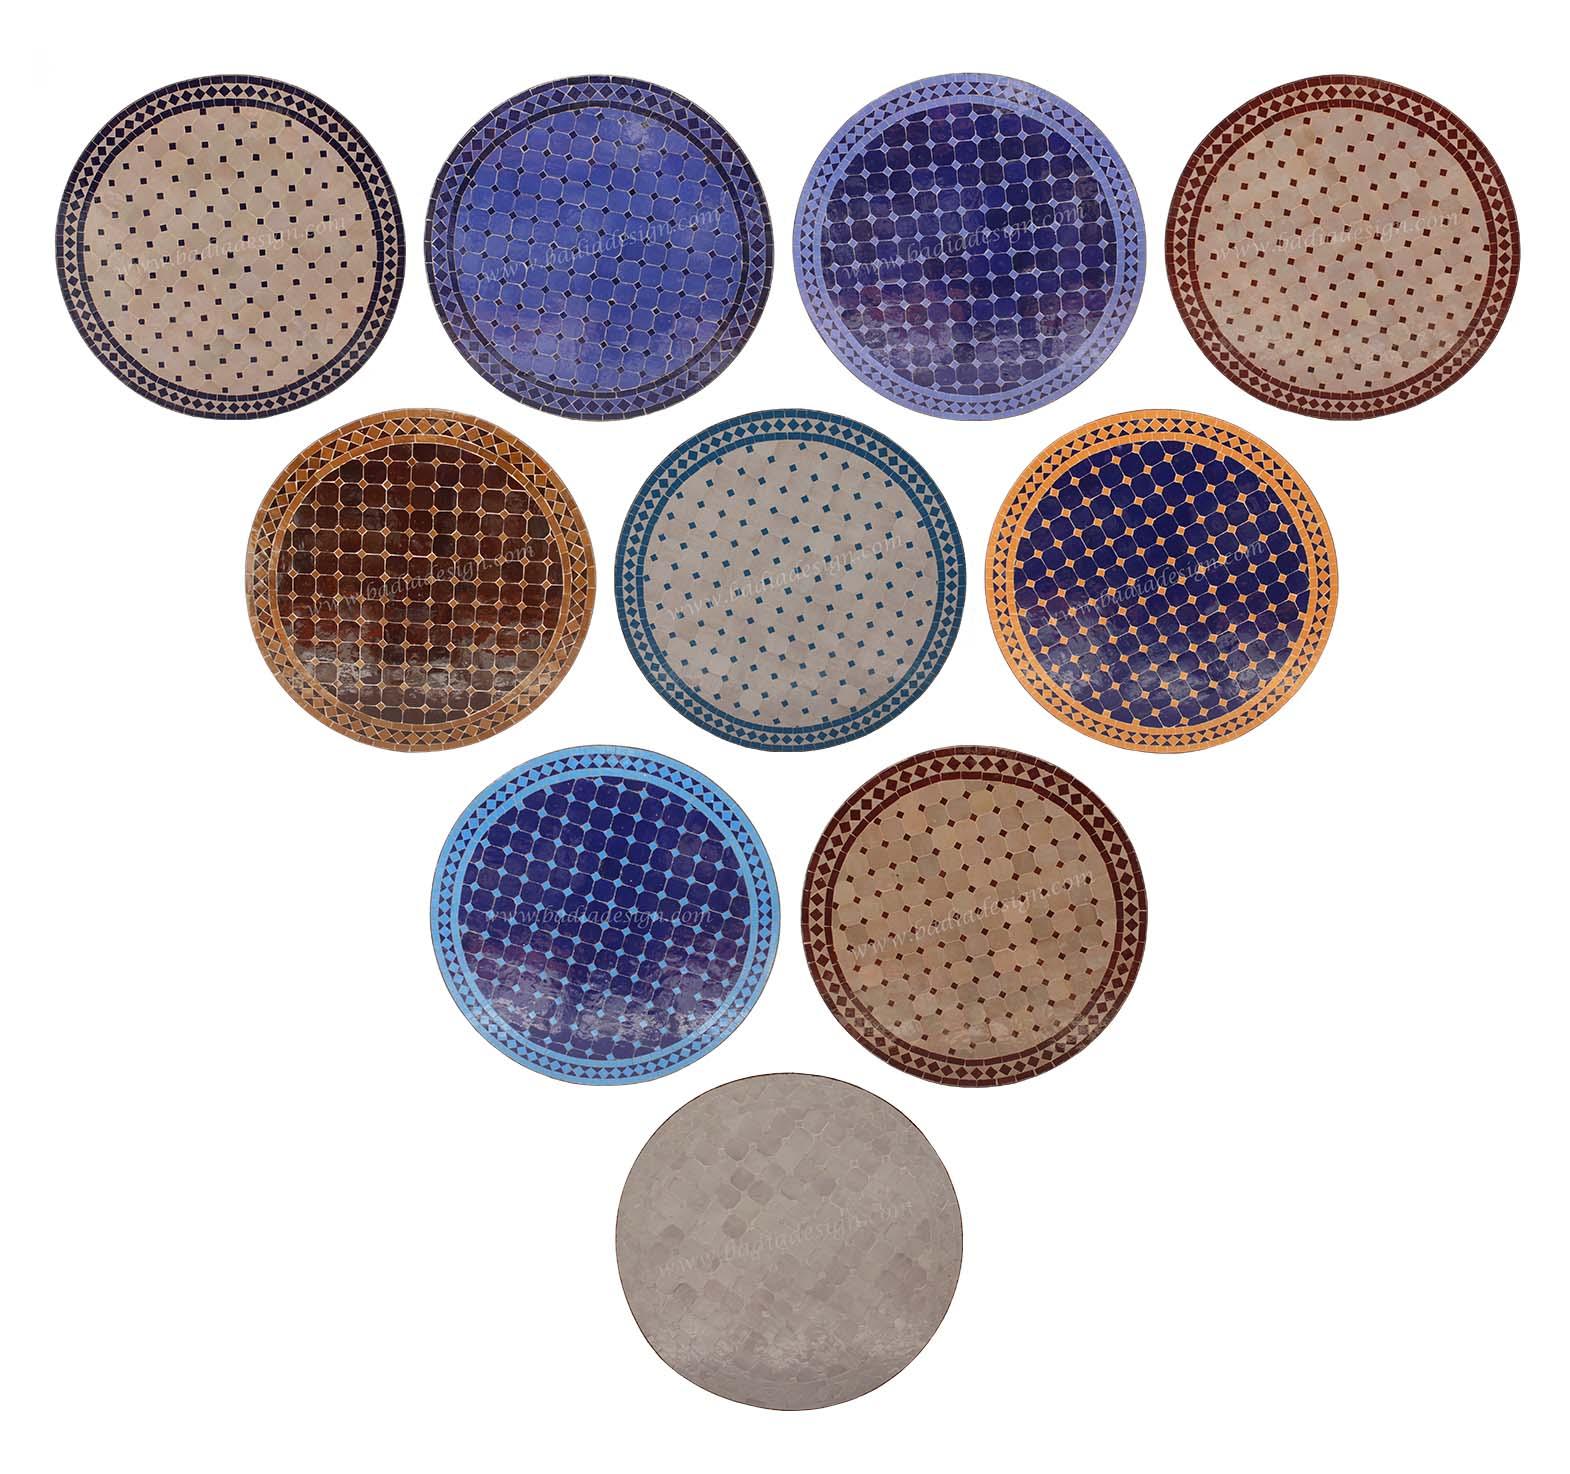 moroccan-tile-table-new-york-mtr220.jpg